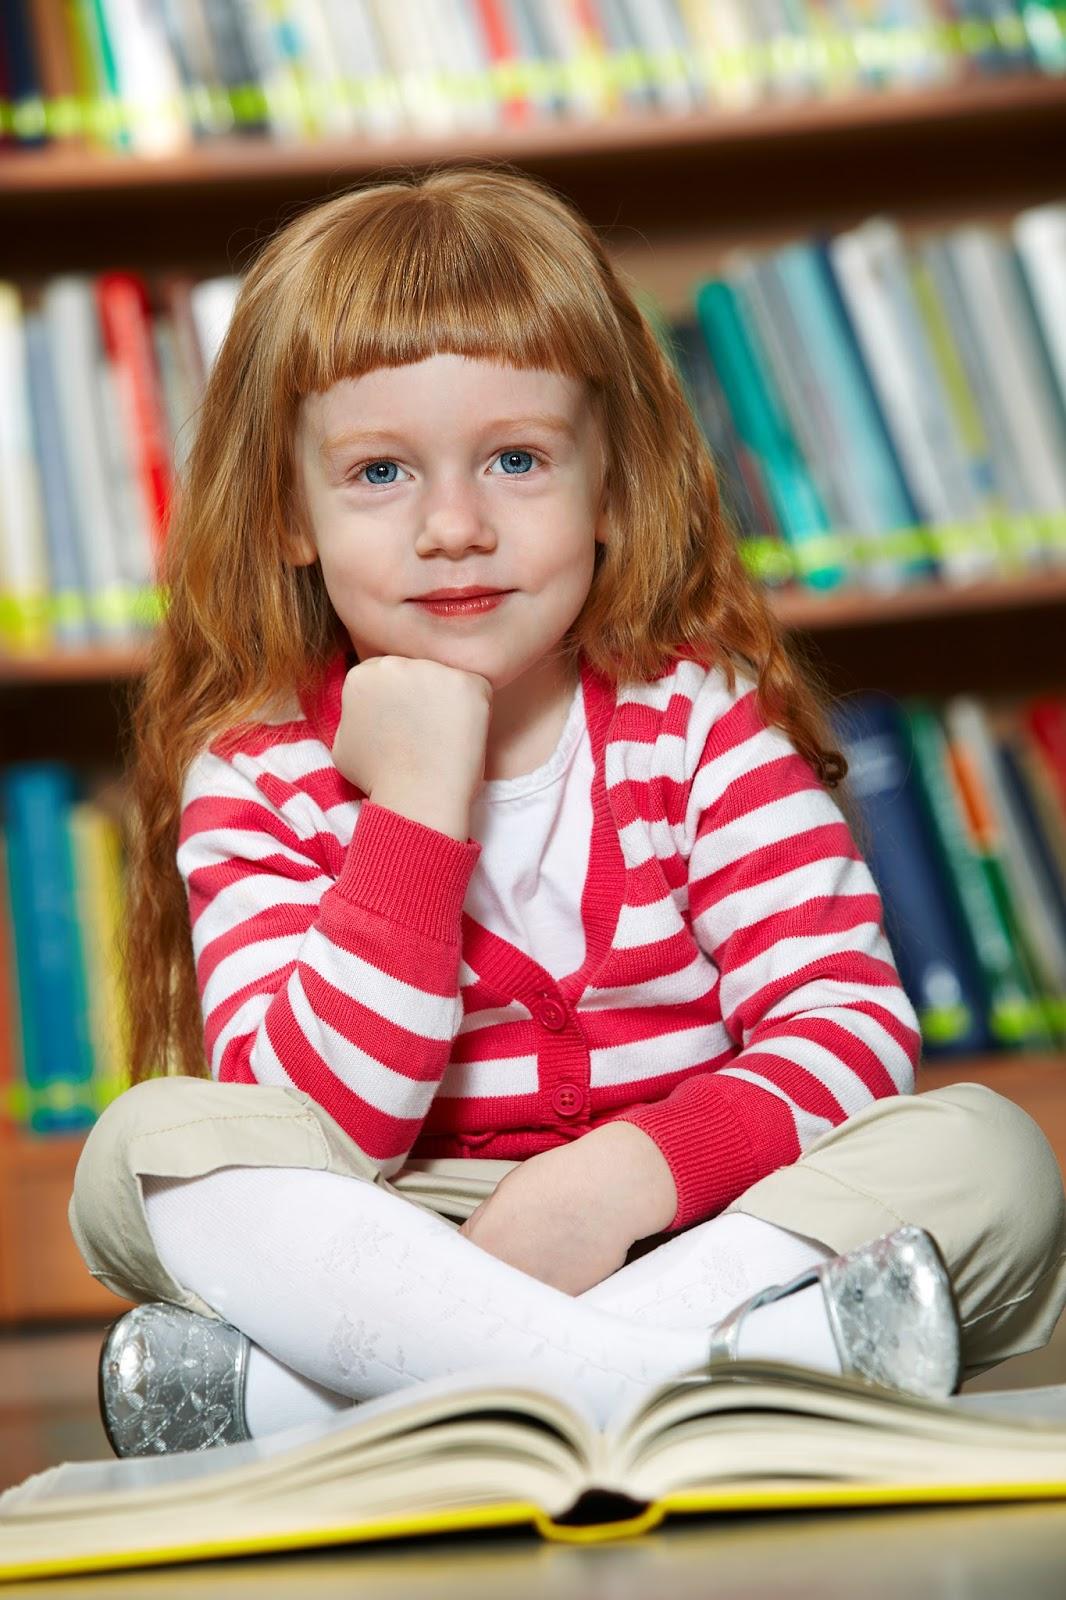 namc montessori circle of inclusion classic presentation. smiling girl in library